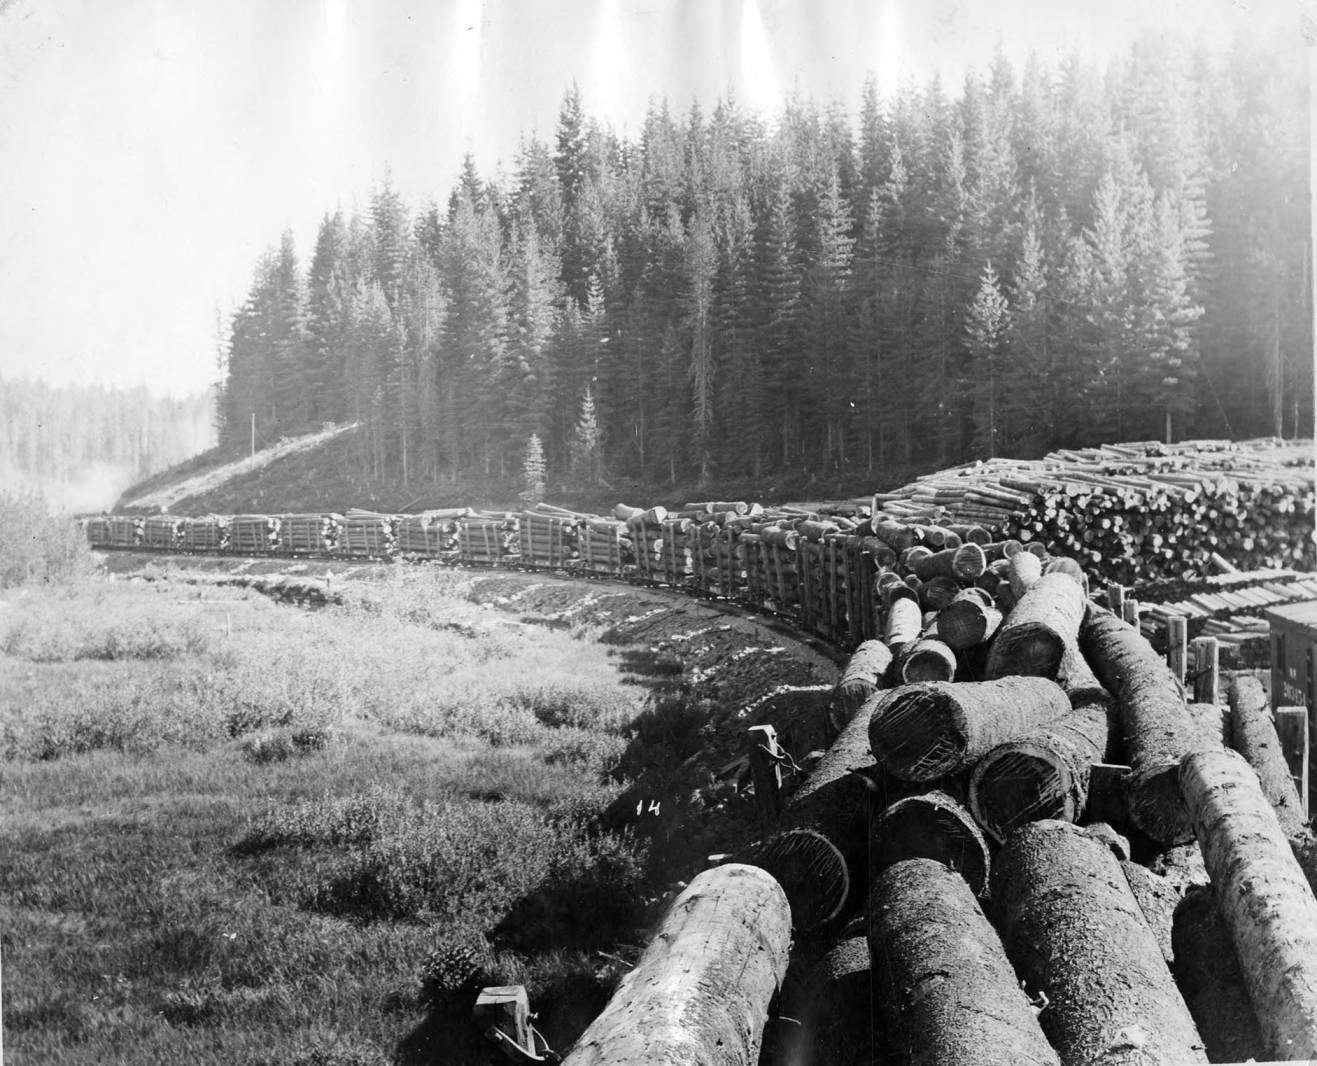 First log train